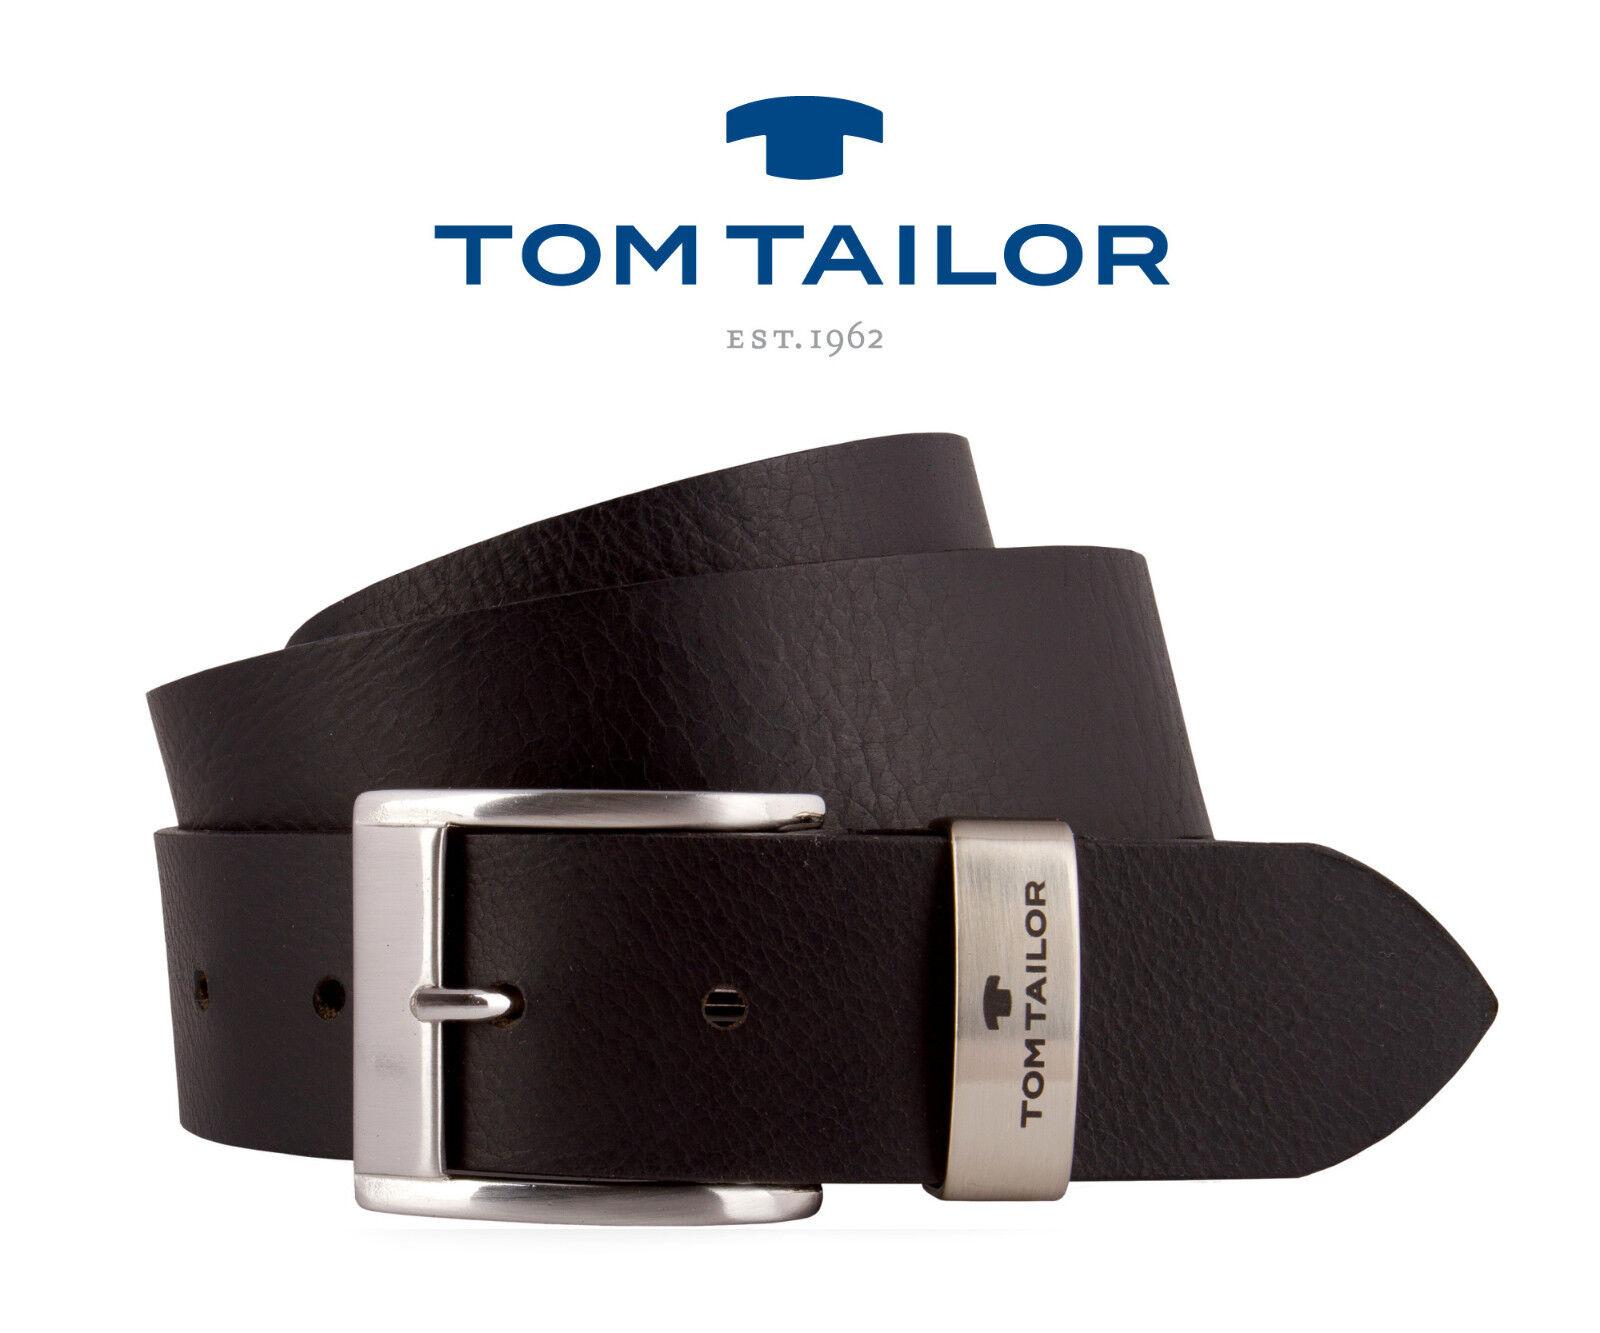 TOM TAILOR Herren Gürtel Herrengürtel Ledergürtel Schwarz 40mm TG1056R01 NEU